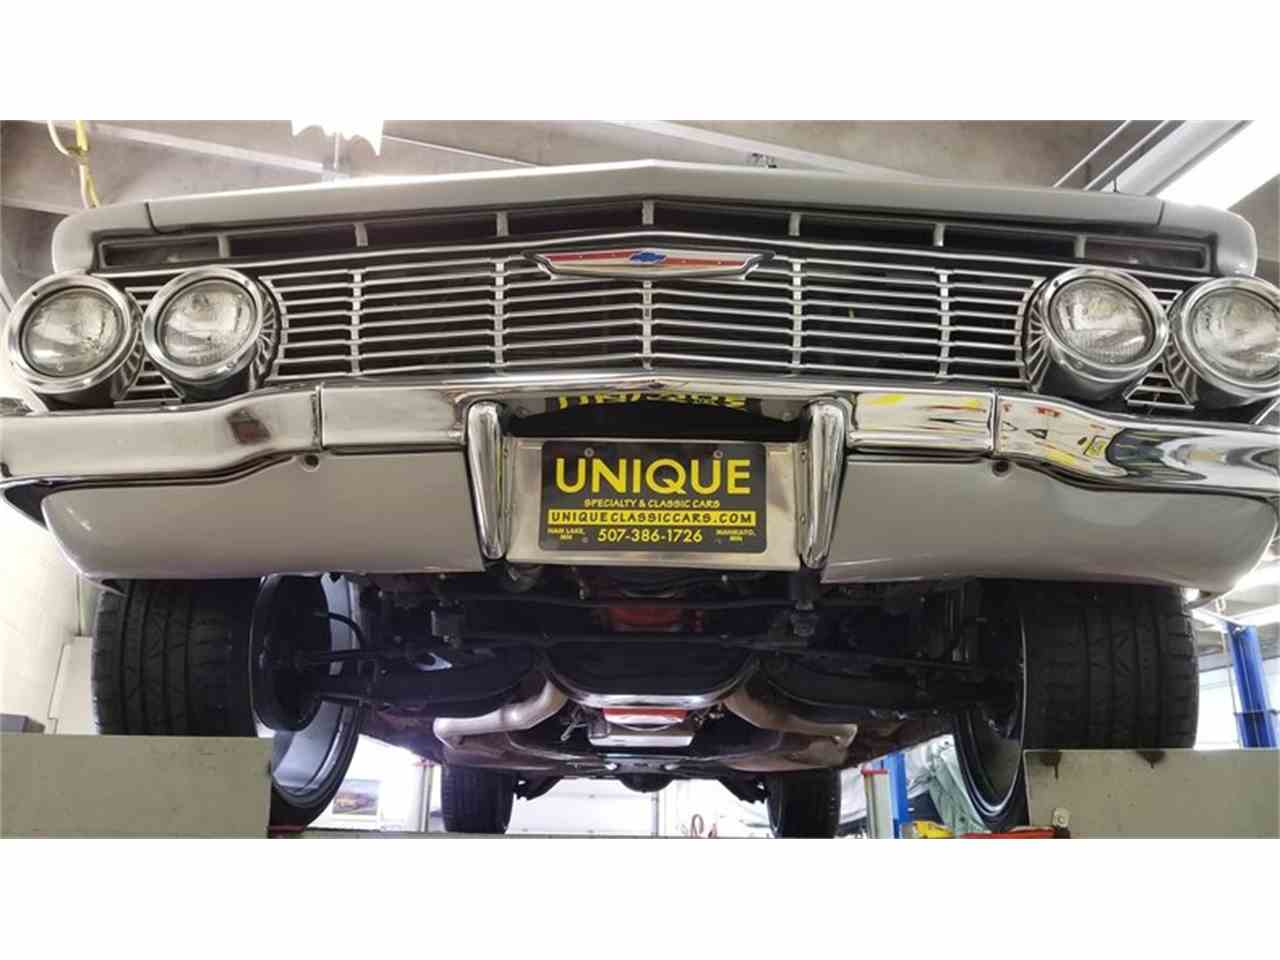 1961 Chevrolet Bel Air Bubble Top Sport Coupe for Sale ...